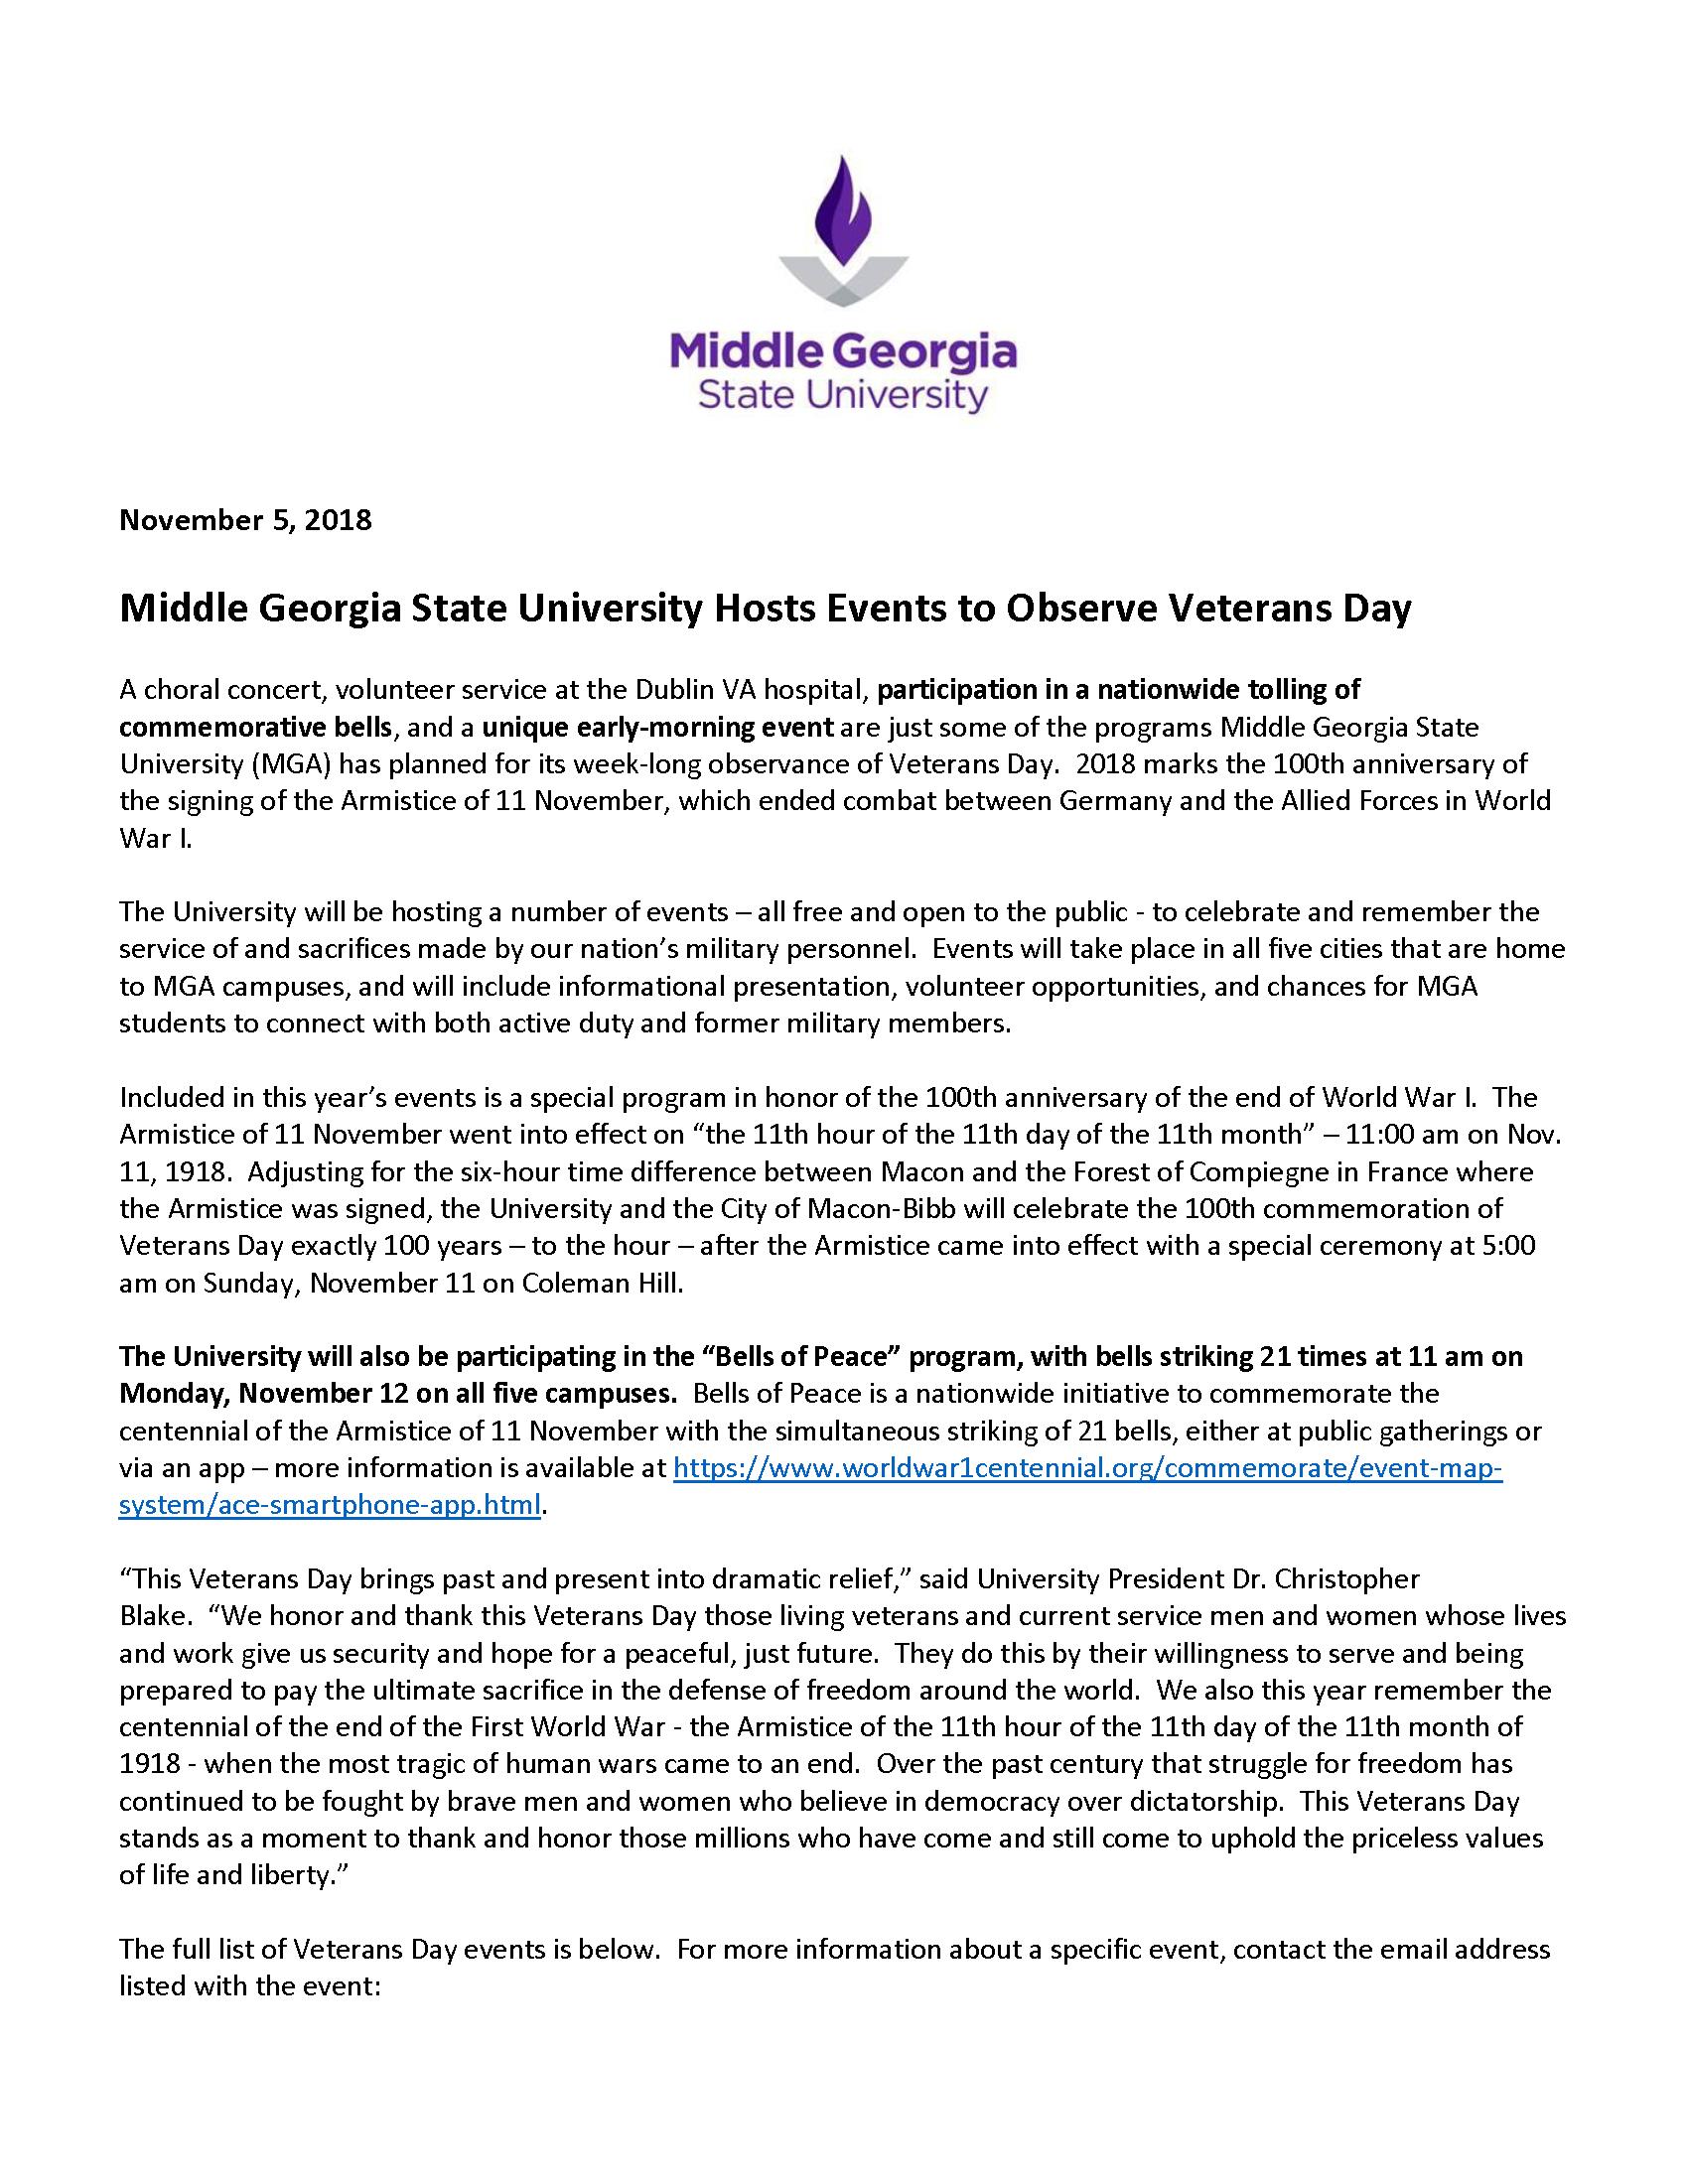 Cochran Bleckley, GA | News & Media